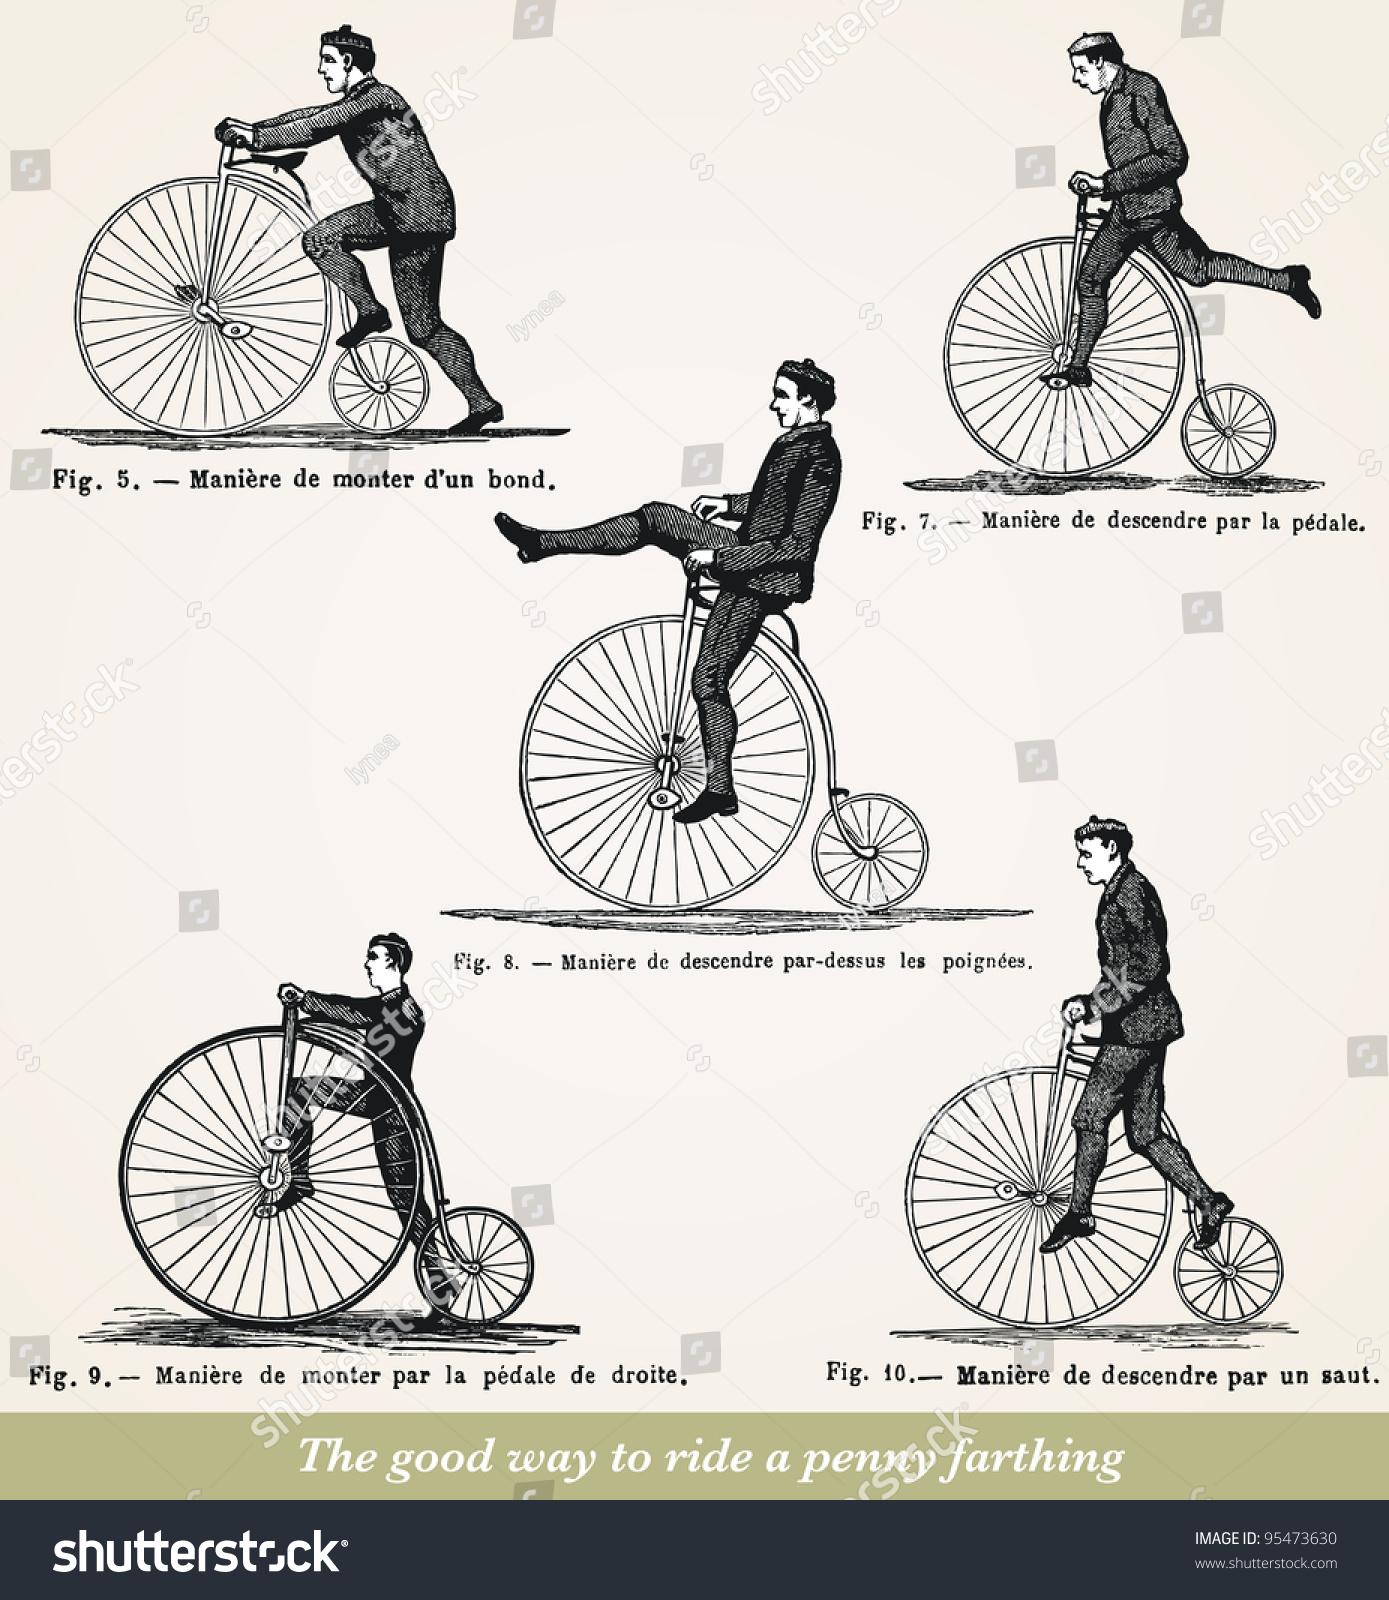 Good Way Ride Penny Farthing Vintage Stock Illustration